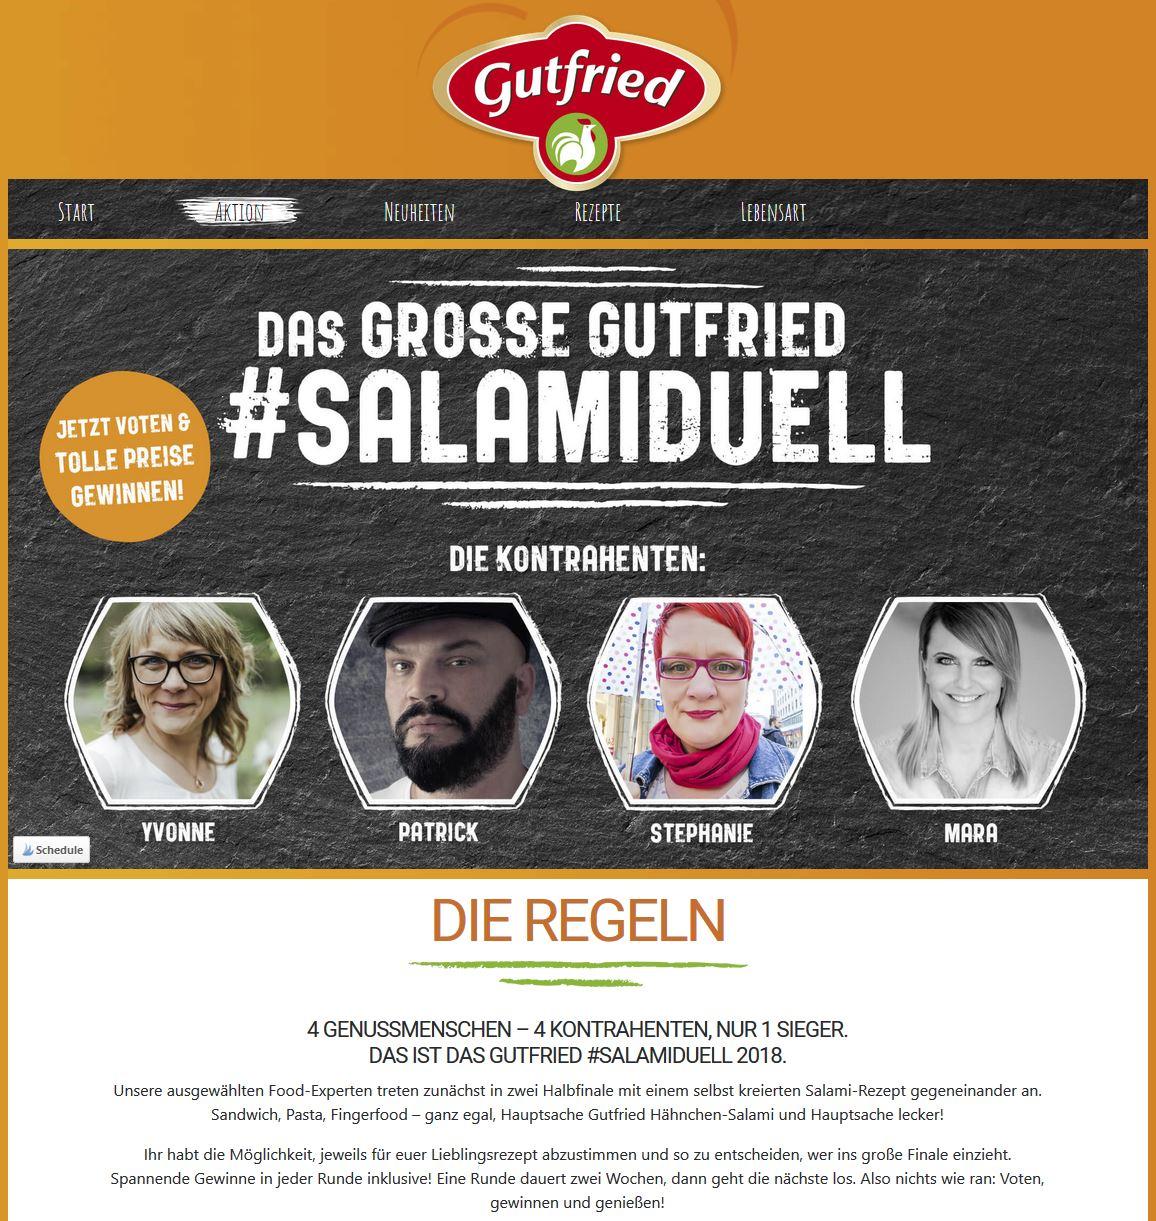 Gutfried Salami Duell